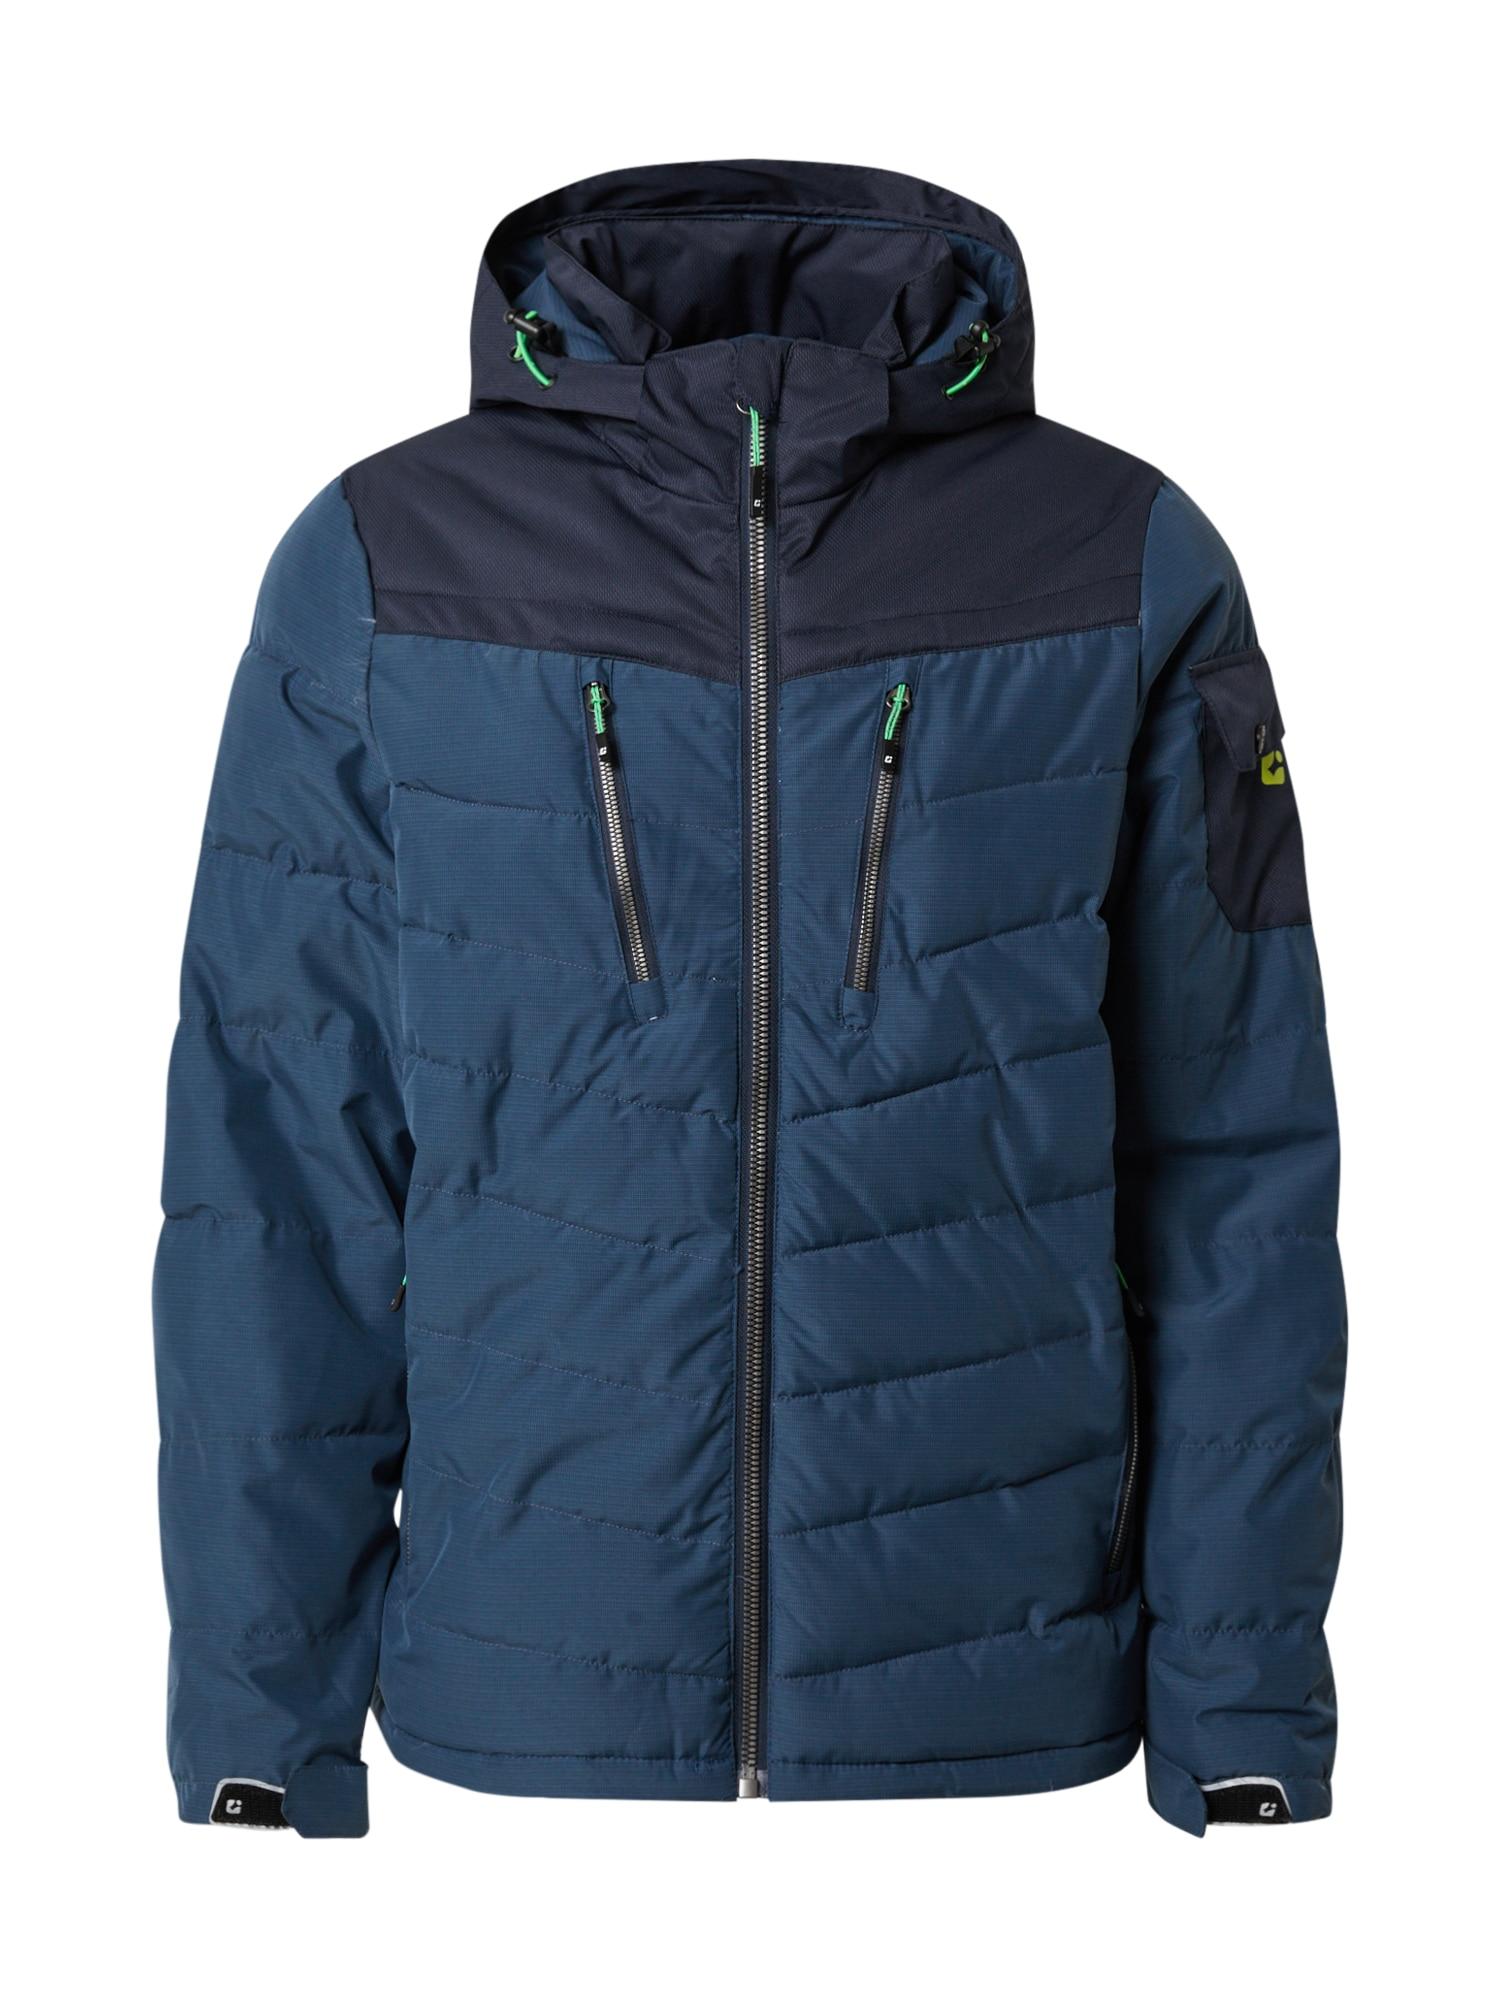 KILLTEC Outdoorová bunda  tmavě modrá / námořnická modř